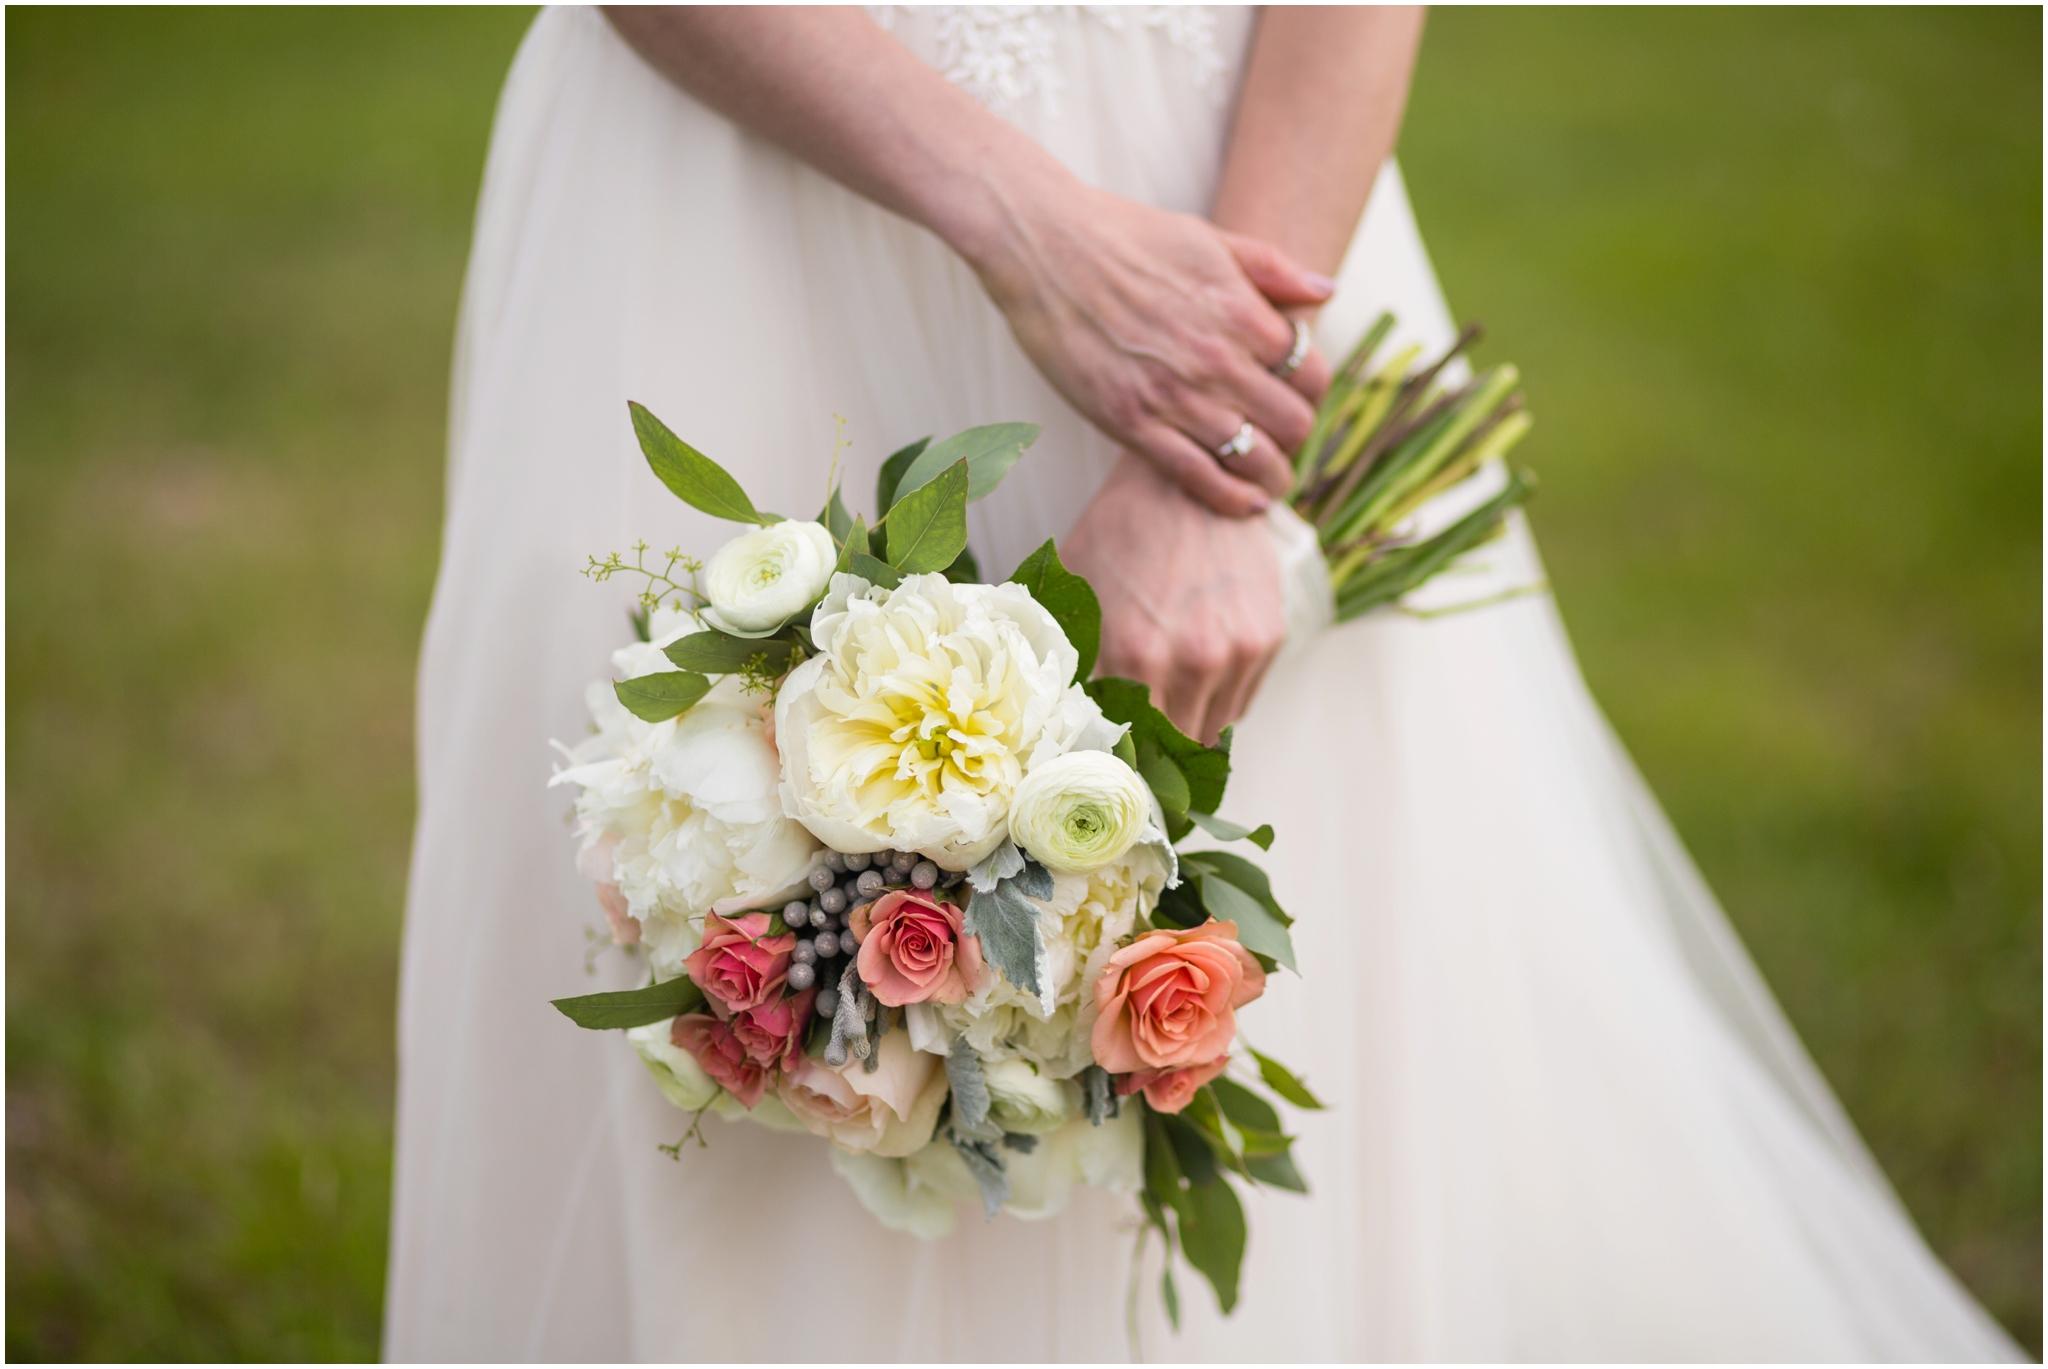 Best_Wedding_Phtoographer_In_Denver_Bouquet.JPG